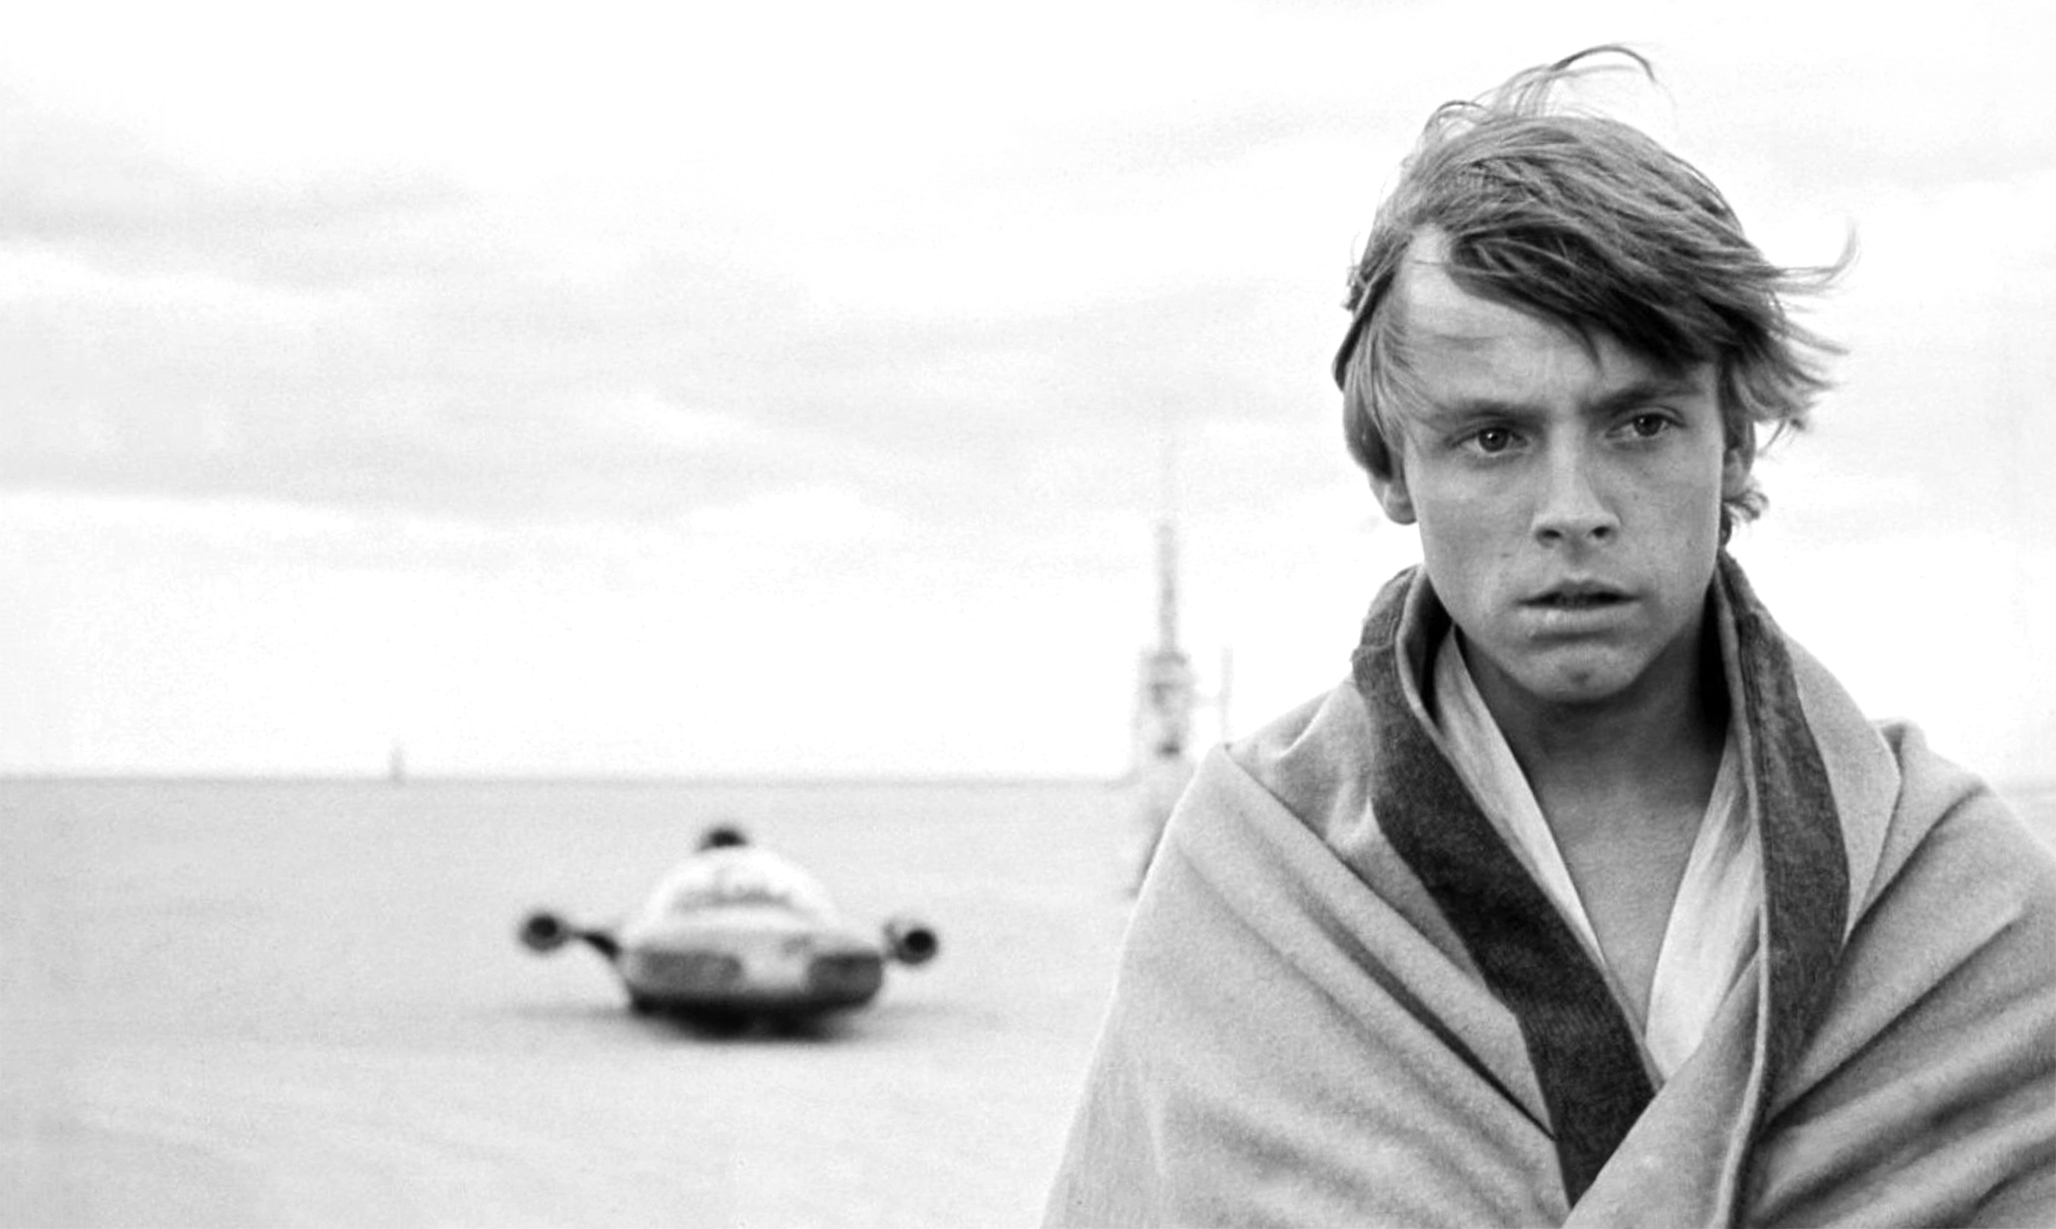 Star-Wars-Luke-Skywalker-Tatooine bw original.jpg